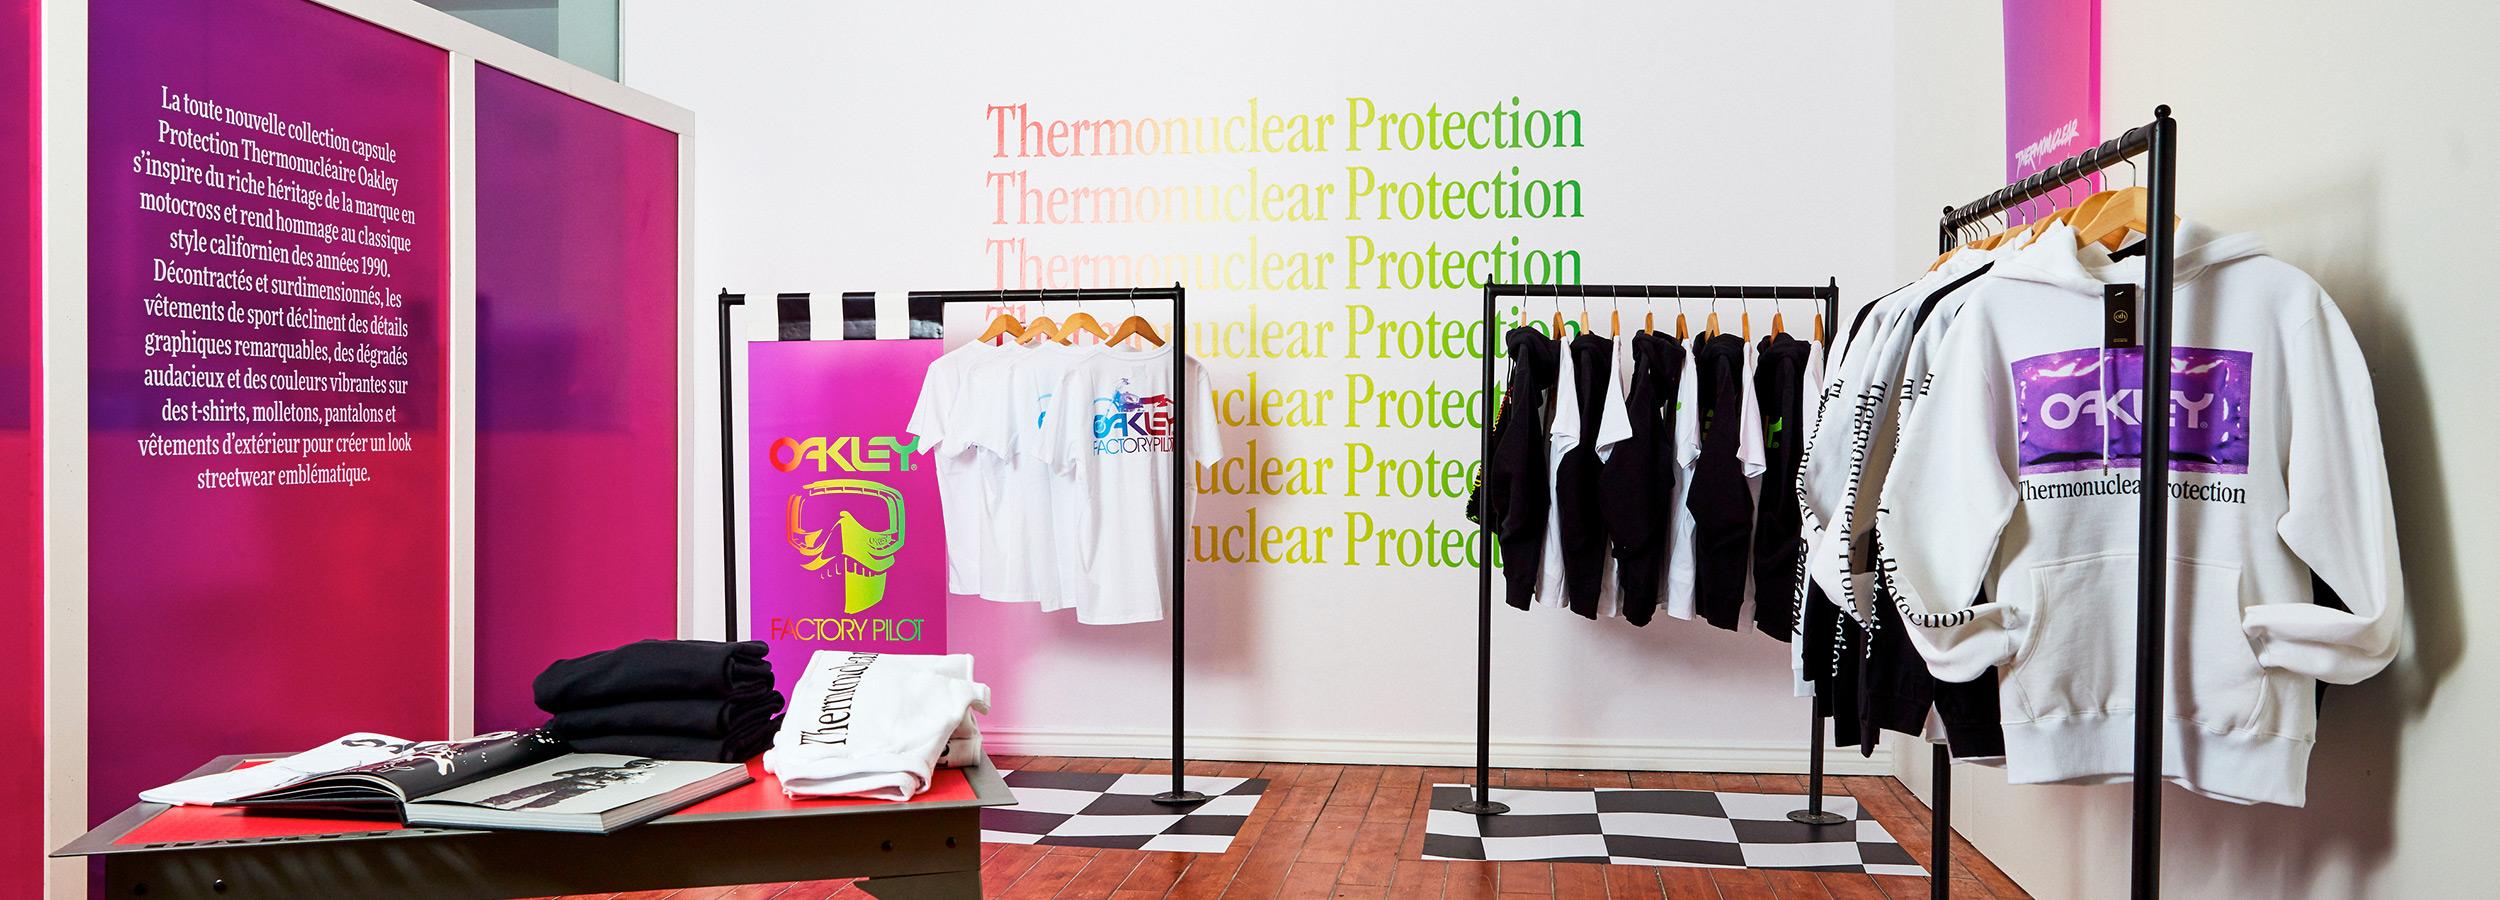 54blue - Calgary Design Studio | Print Shop & Inhouse Fabrication